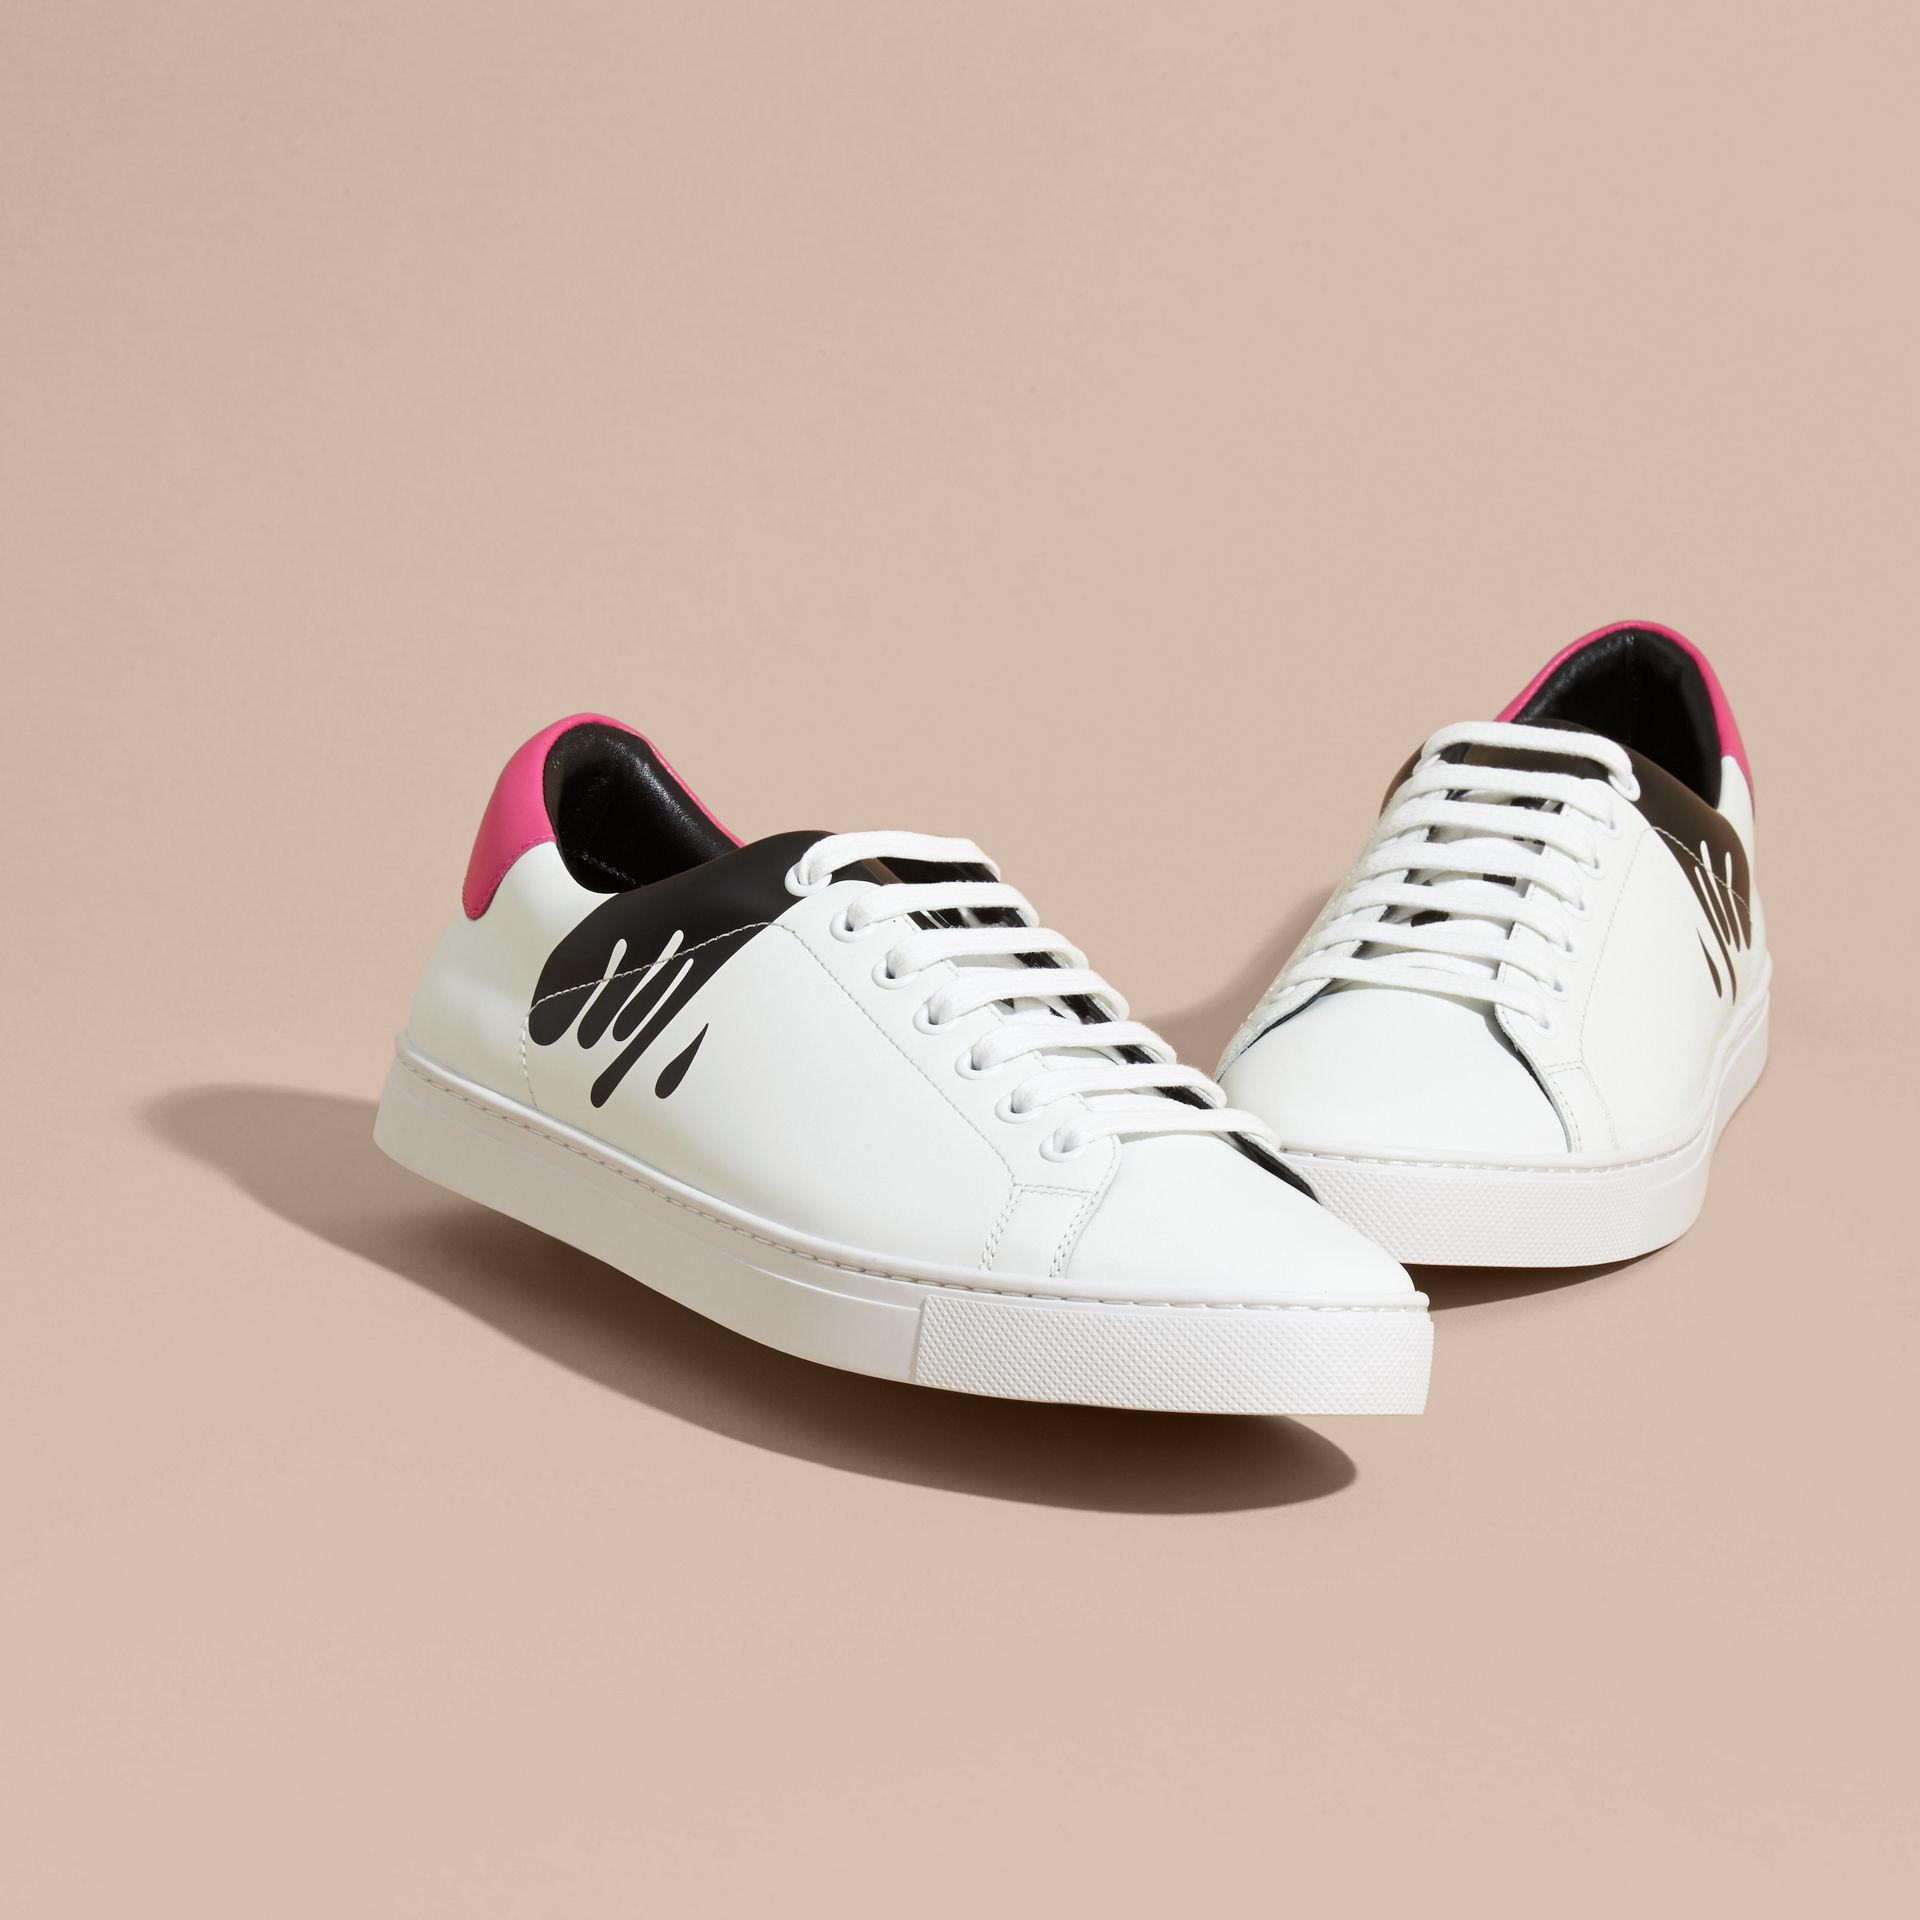 Burberry Splash Motif Leather Trainers Optic White/black